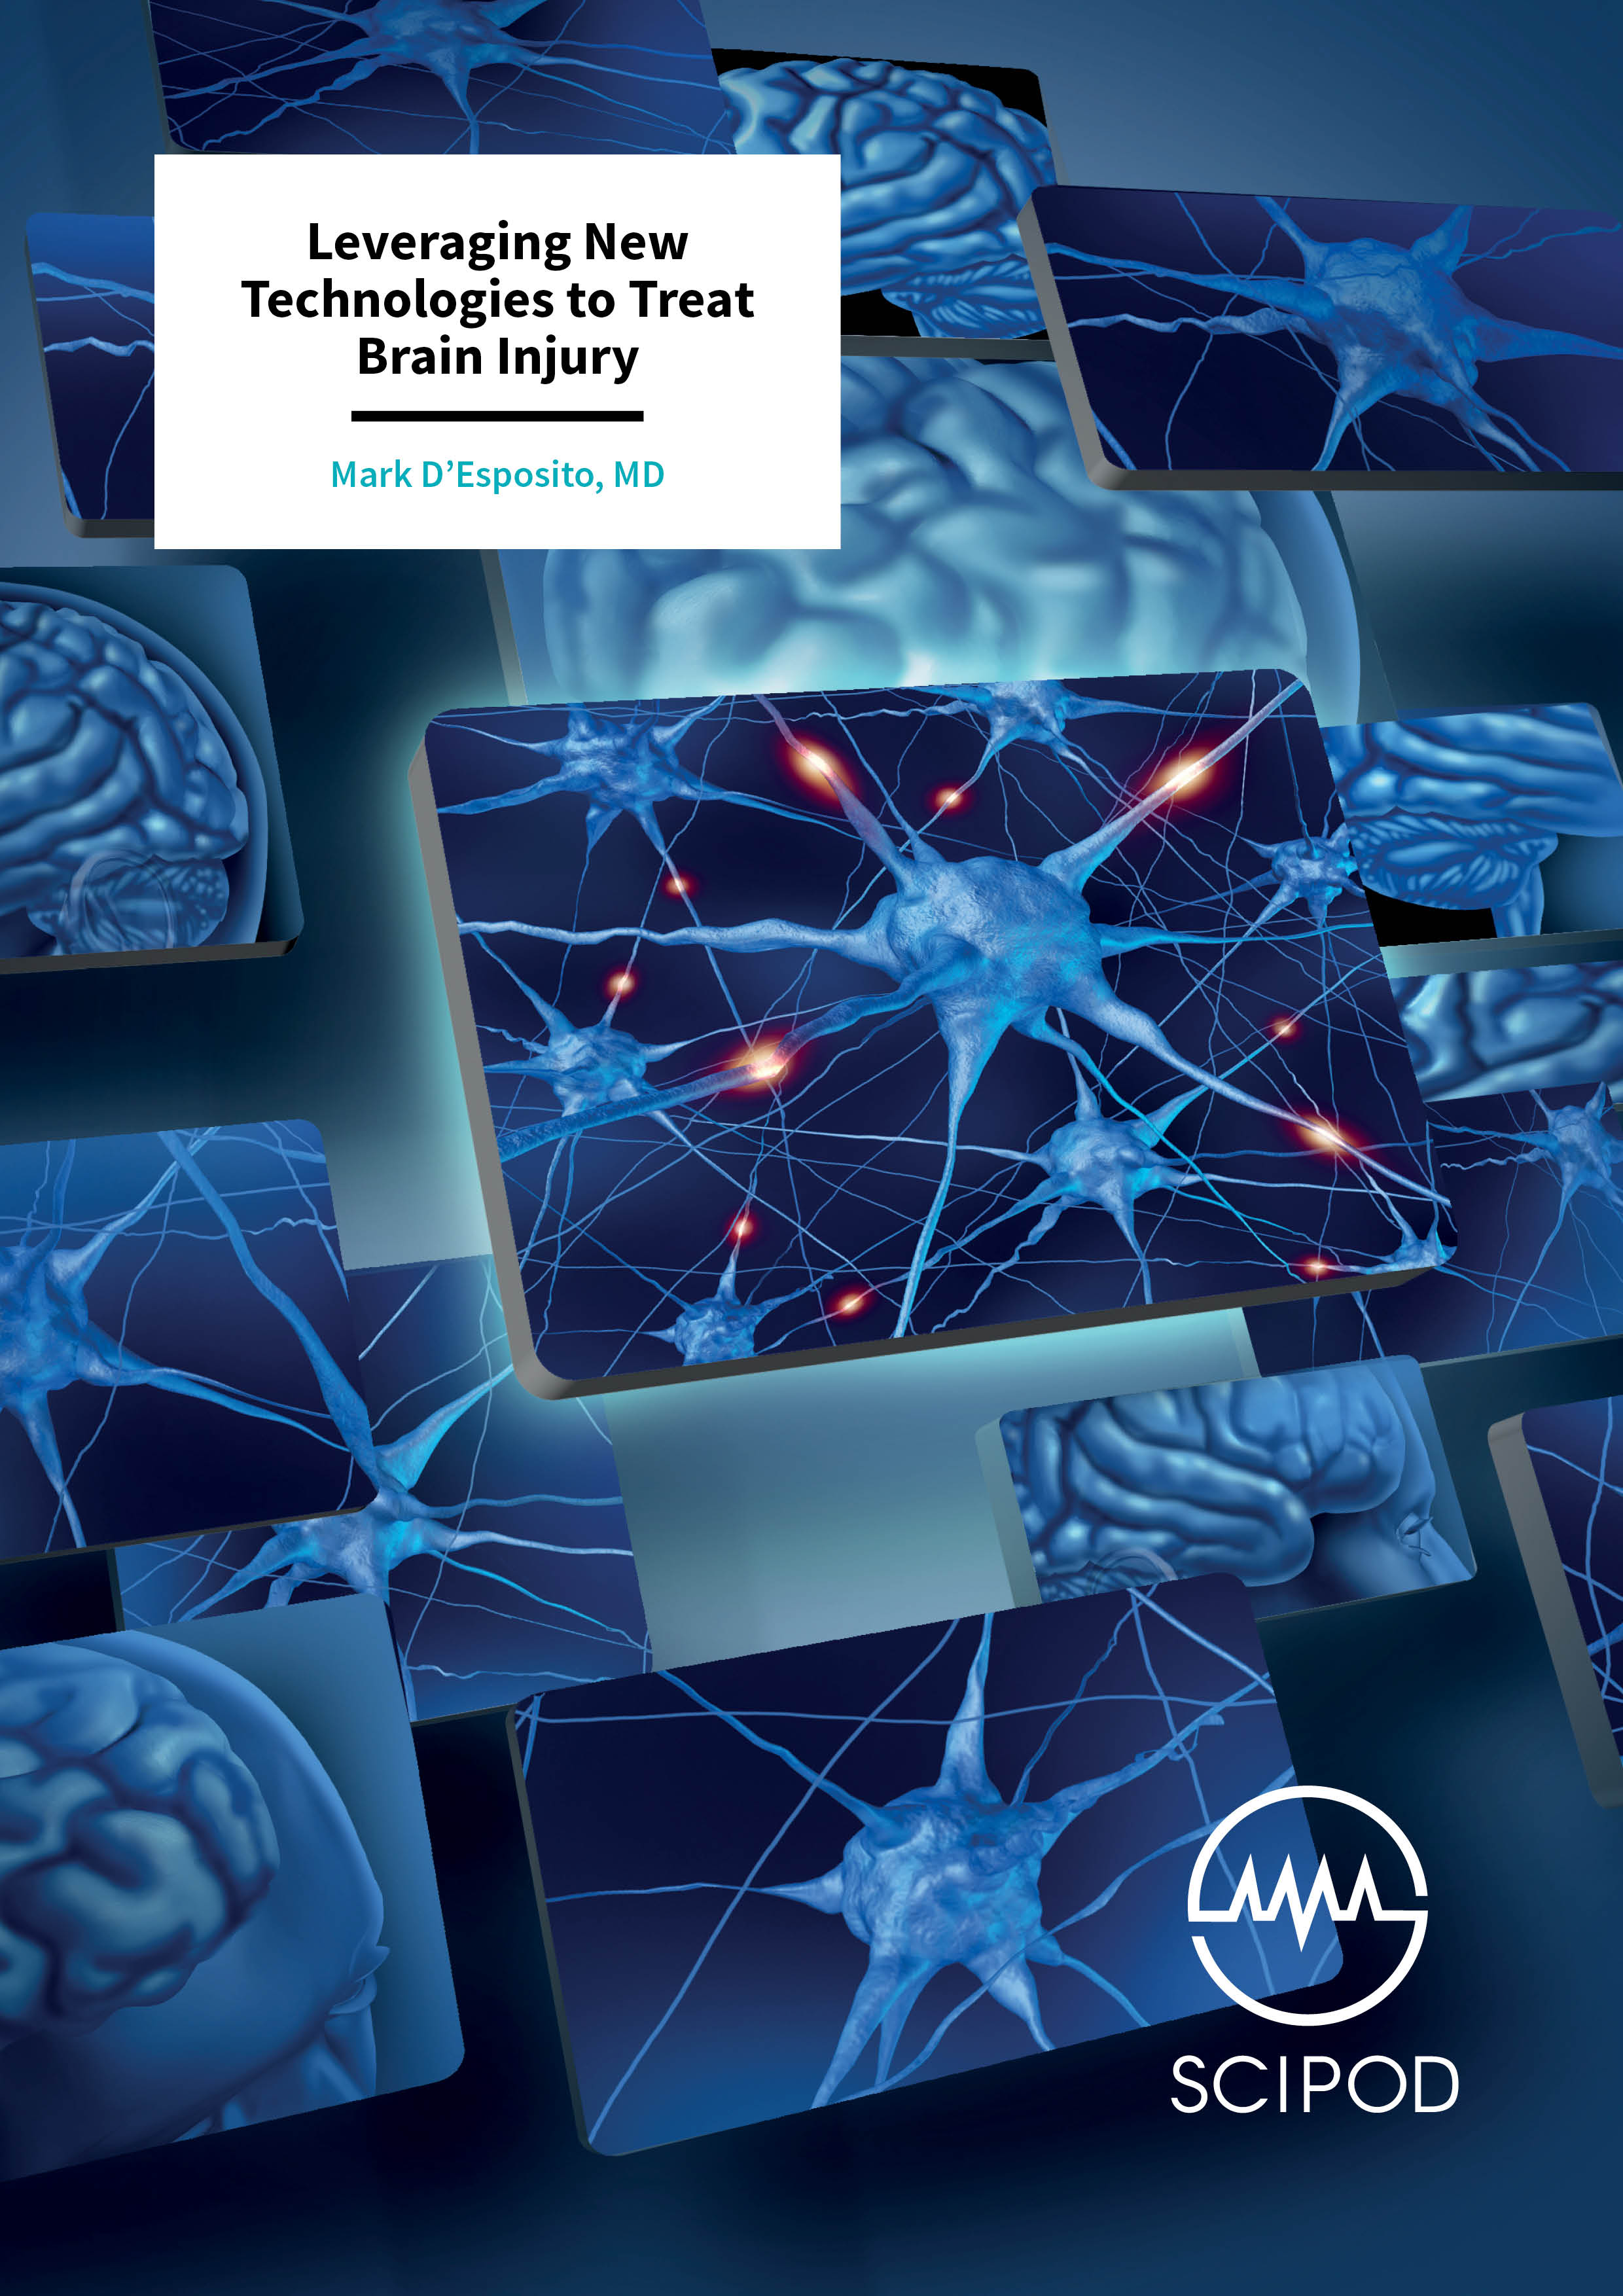 Leveraging New Technologies to Treat  Brain Injury – Mark D'Esposito, MD, University of California, Berkeley